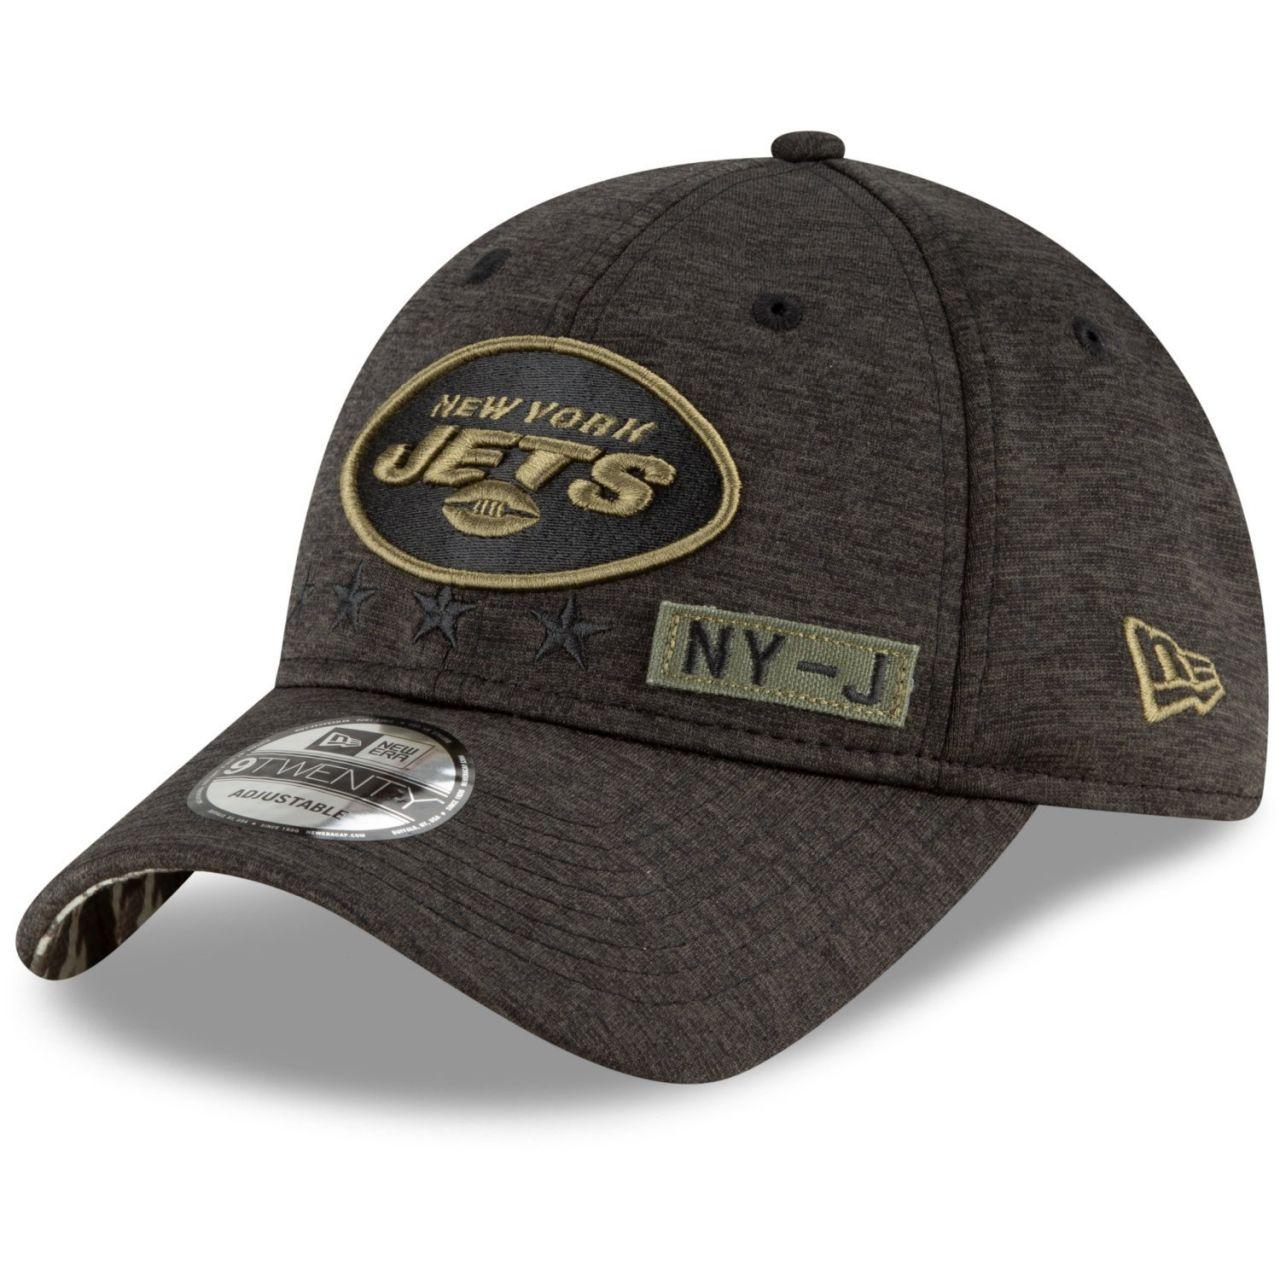 amfoo - New Era 9TWENTY Cap Salute to Service New York Jets